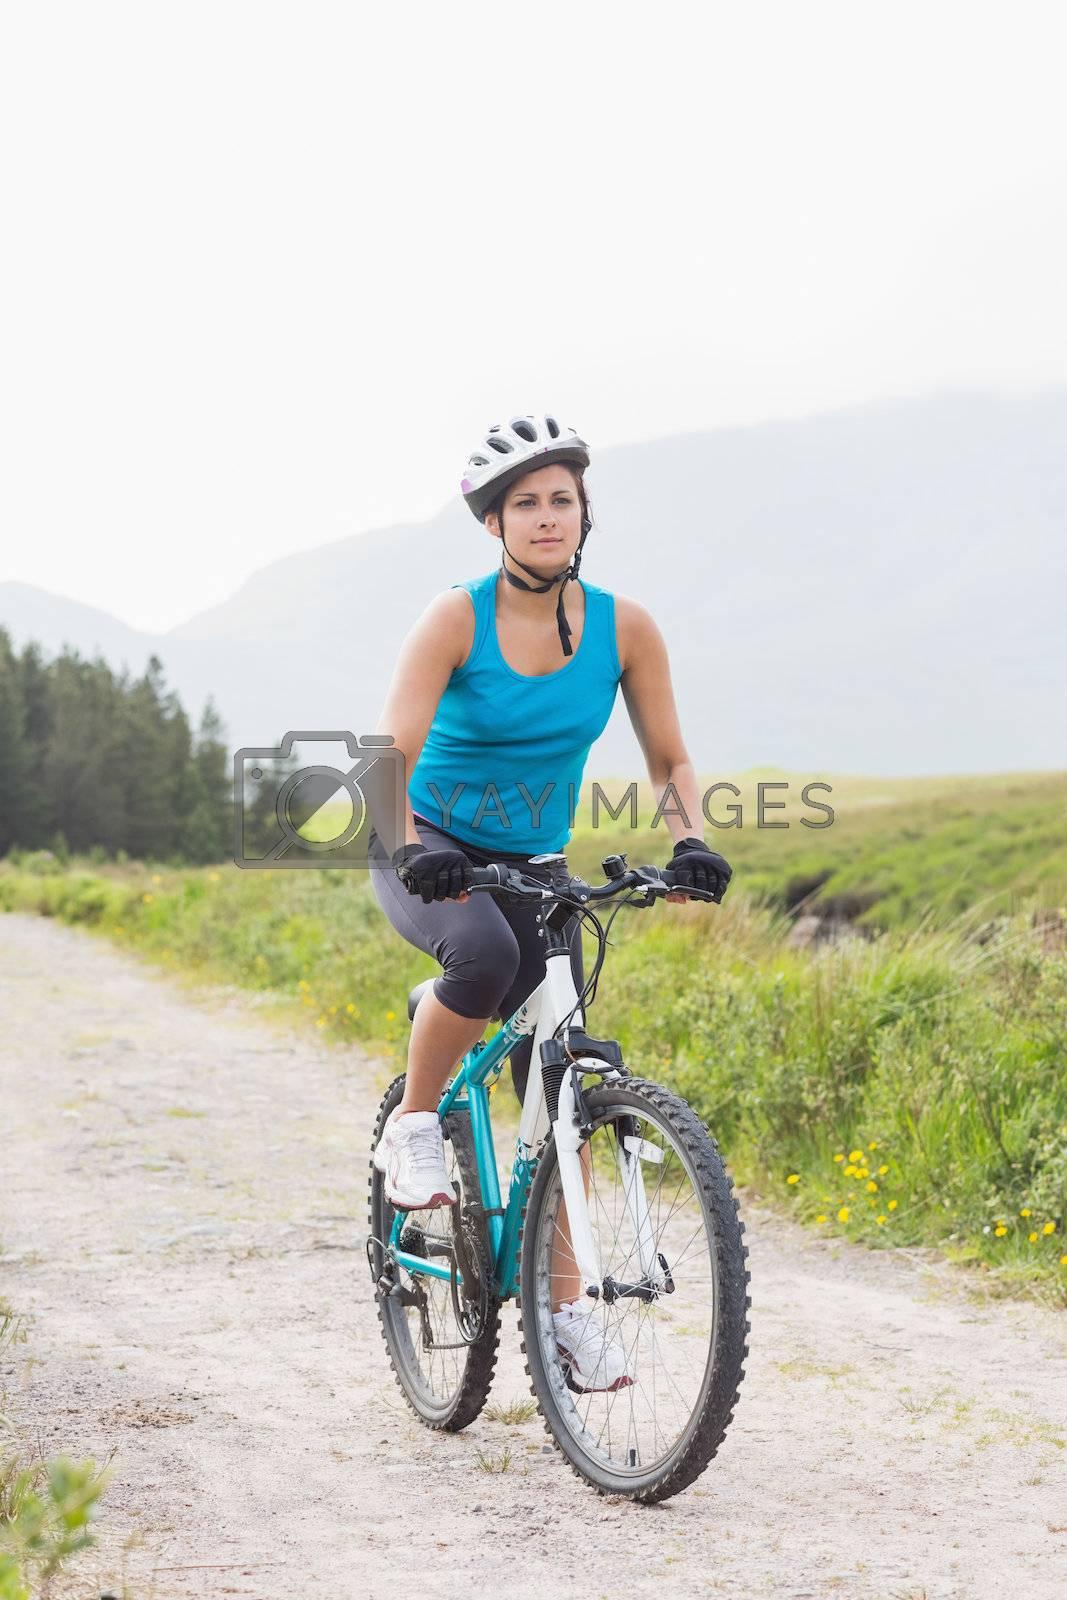 Fit woman riding mountain bike by Wavebreakmedia